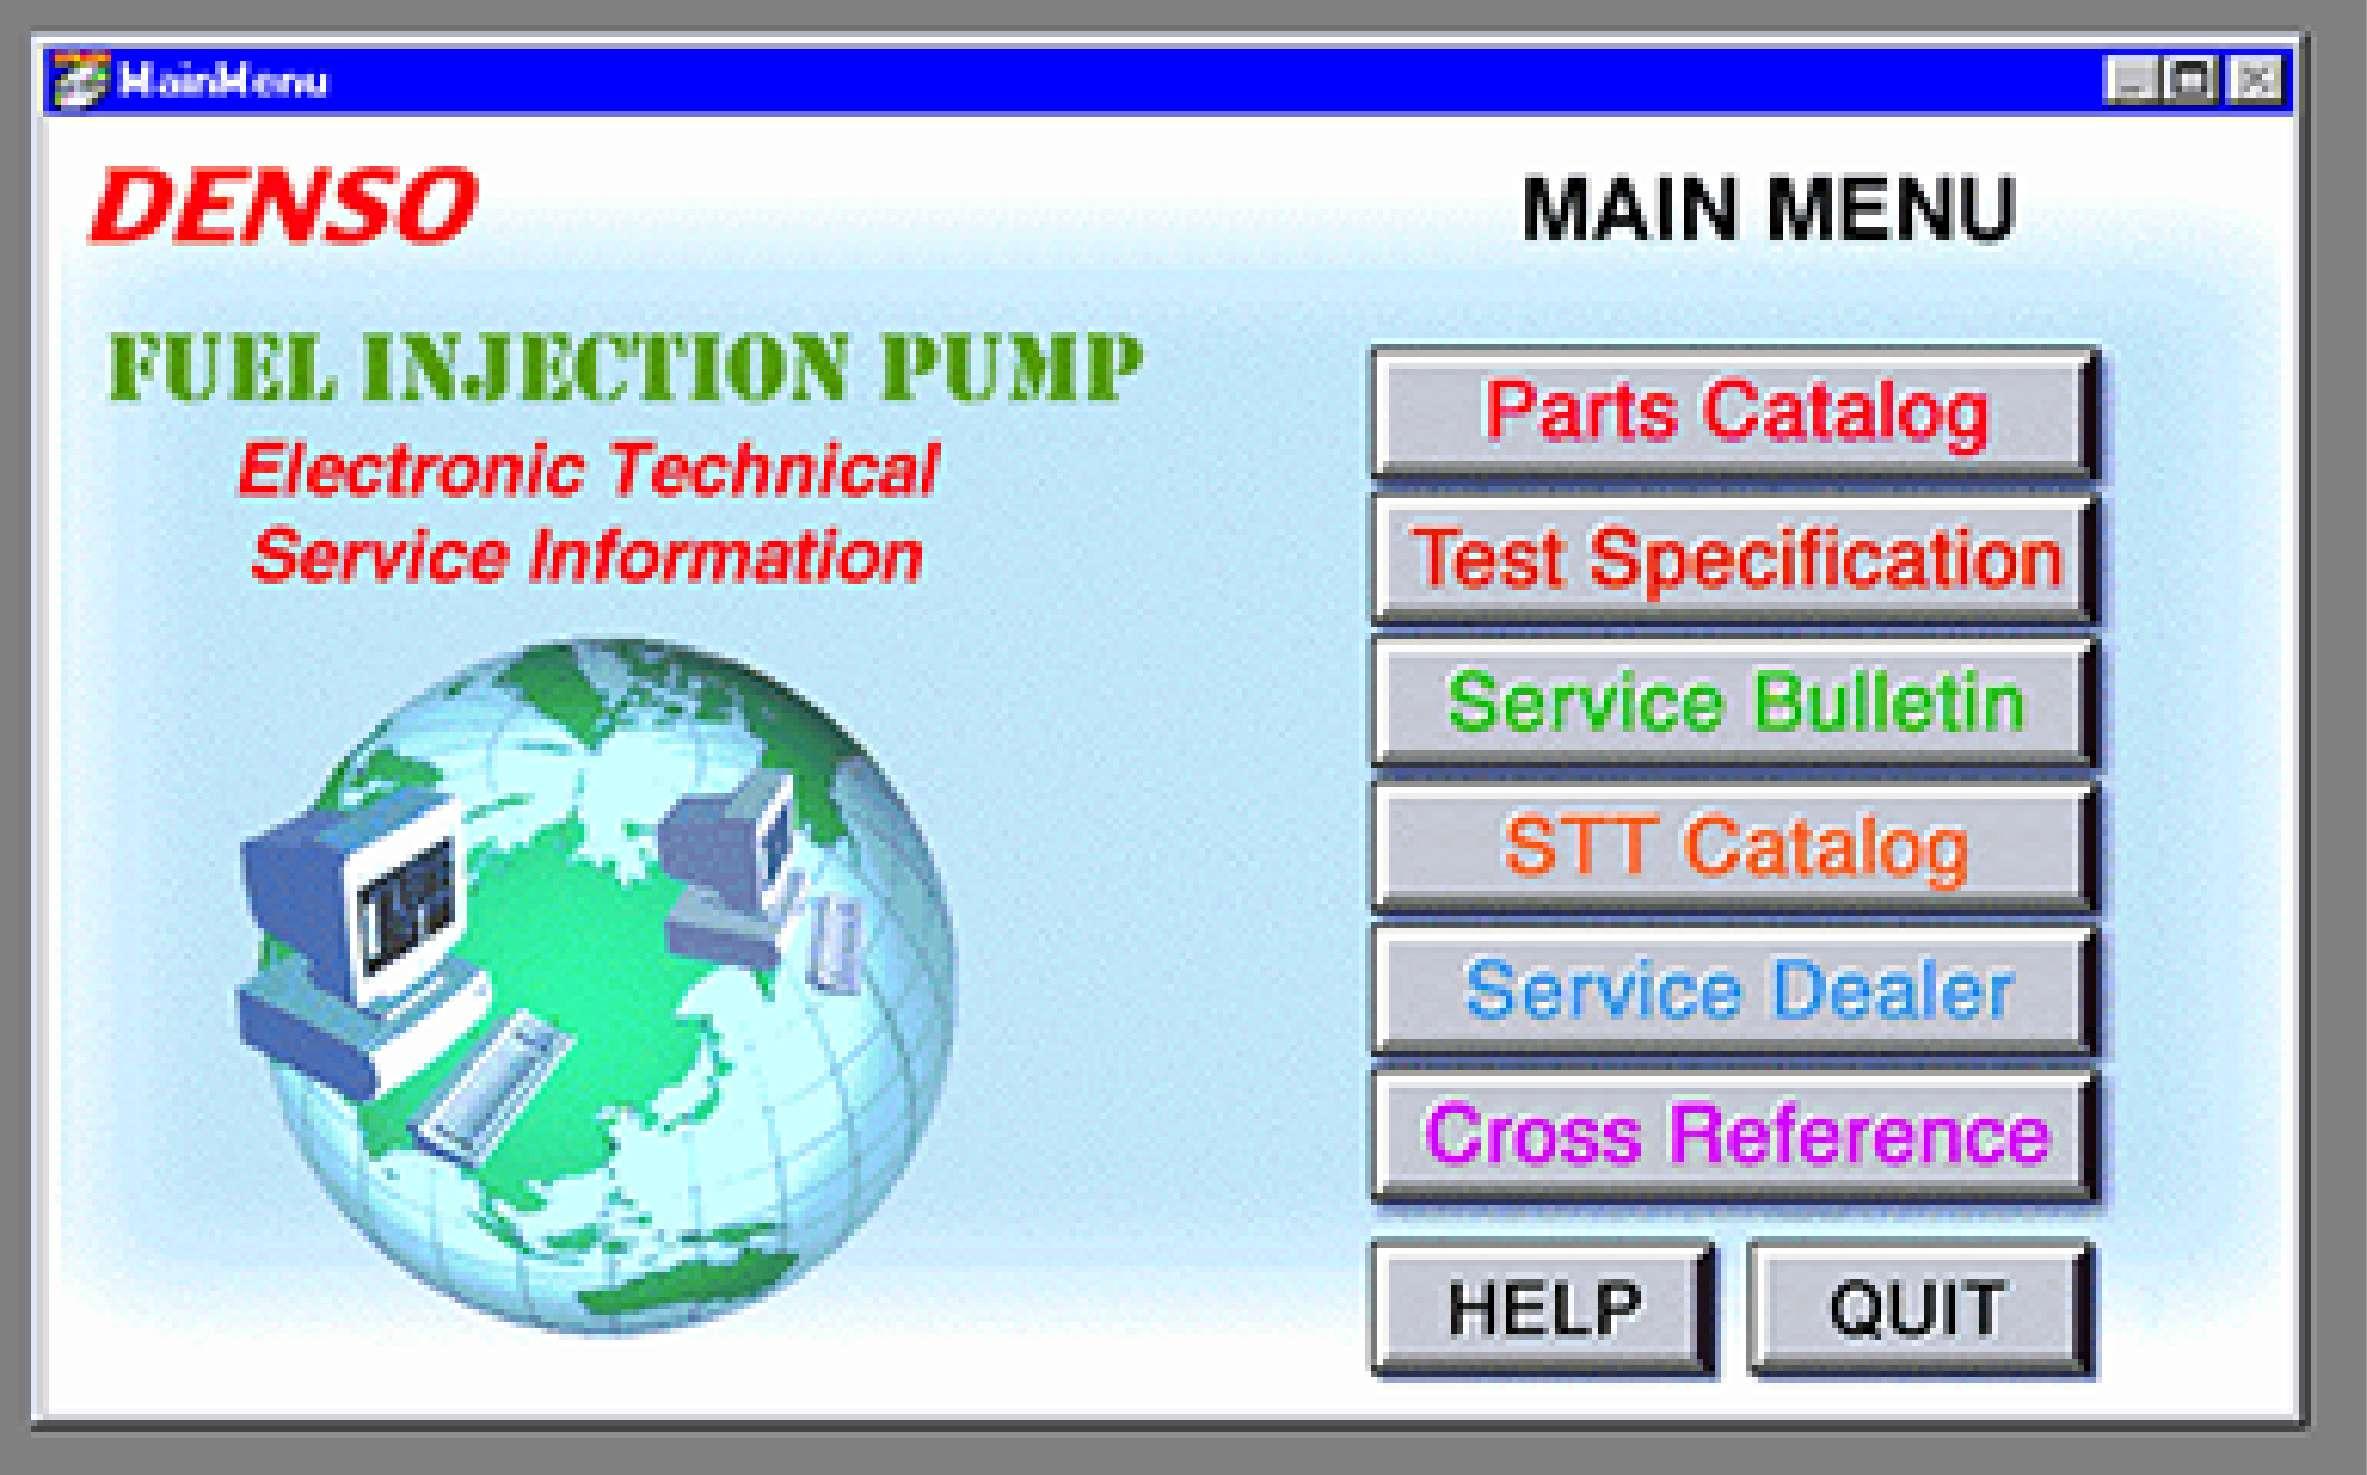 Denso ETSI (Electronic Technical Service Information) SS-01